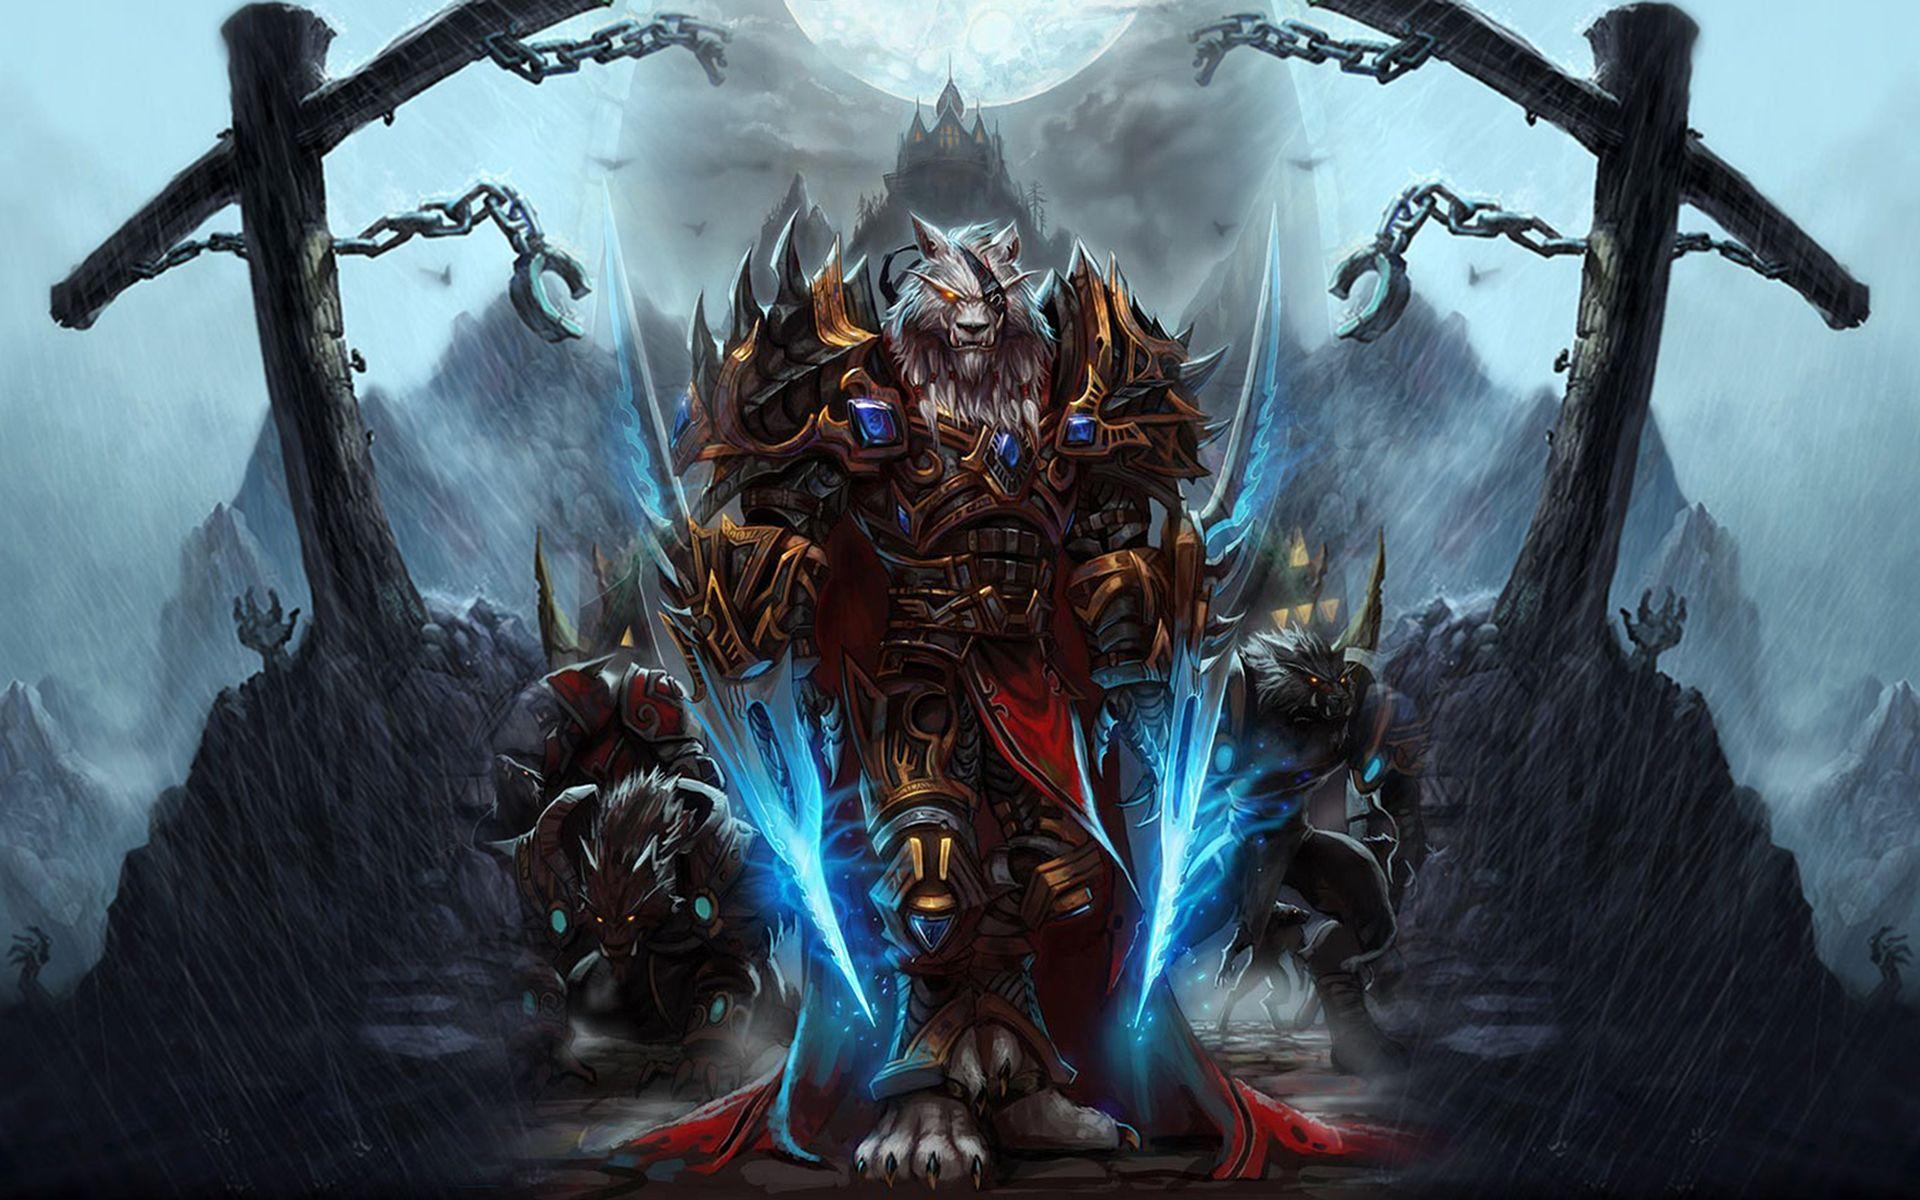 Worgen Rogue Wallpaper World Of Warcraft Wallpaper World Of Warcraft World Of Warcraft Cataclysm